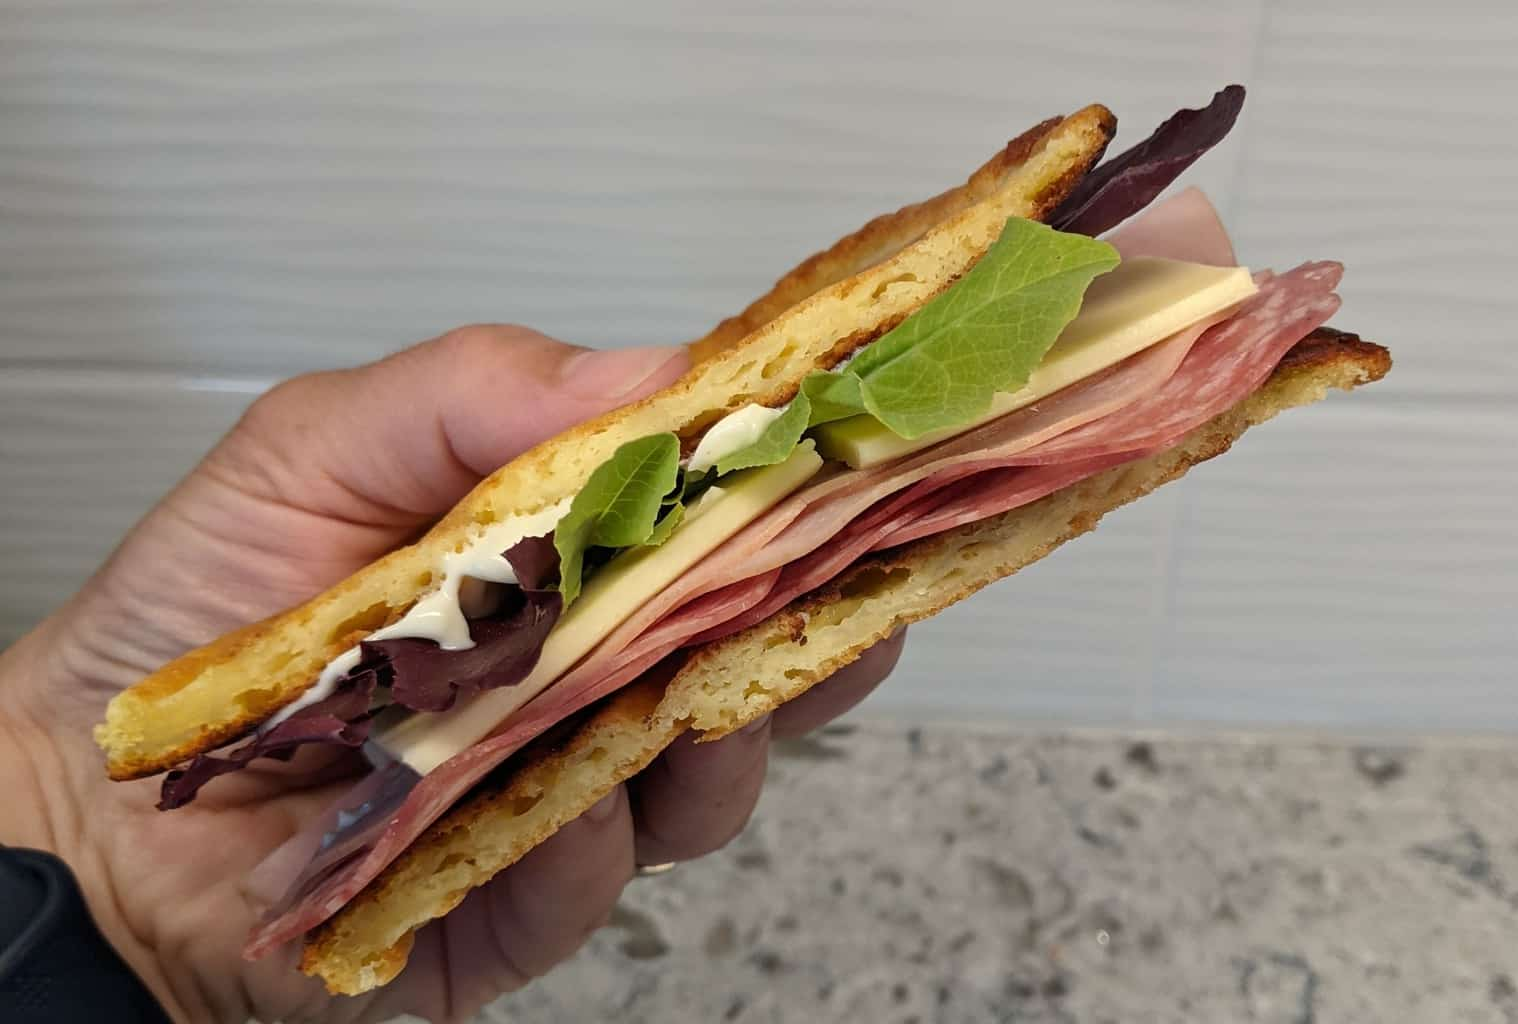 hand holding a flatbread sandwich